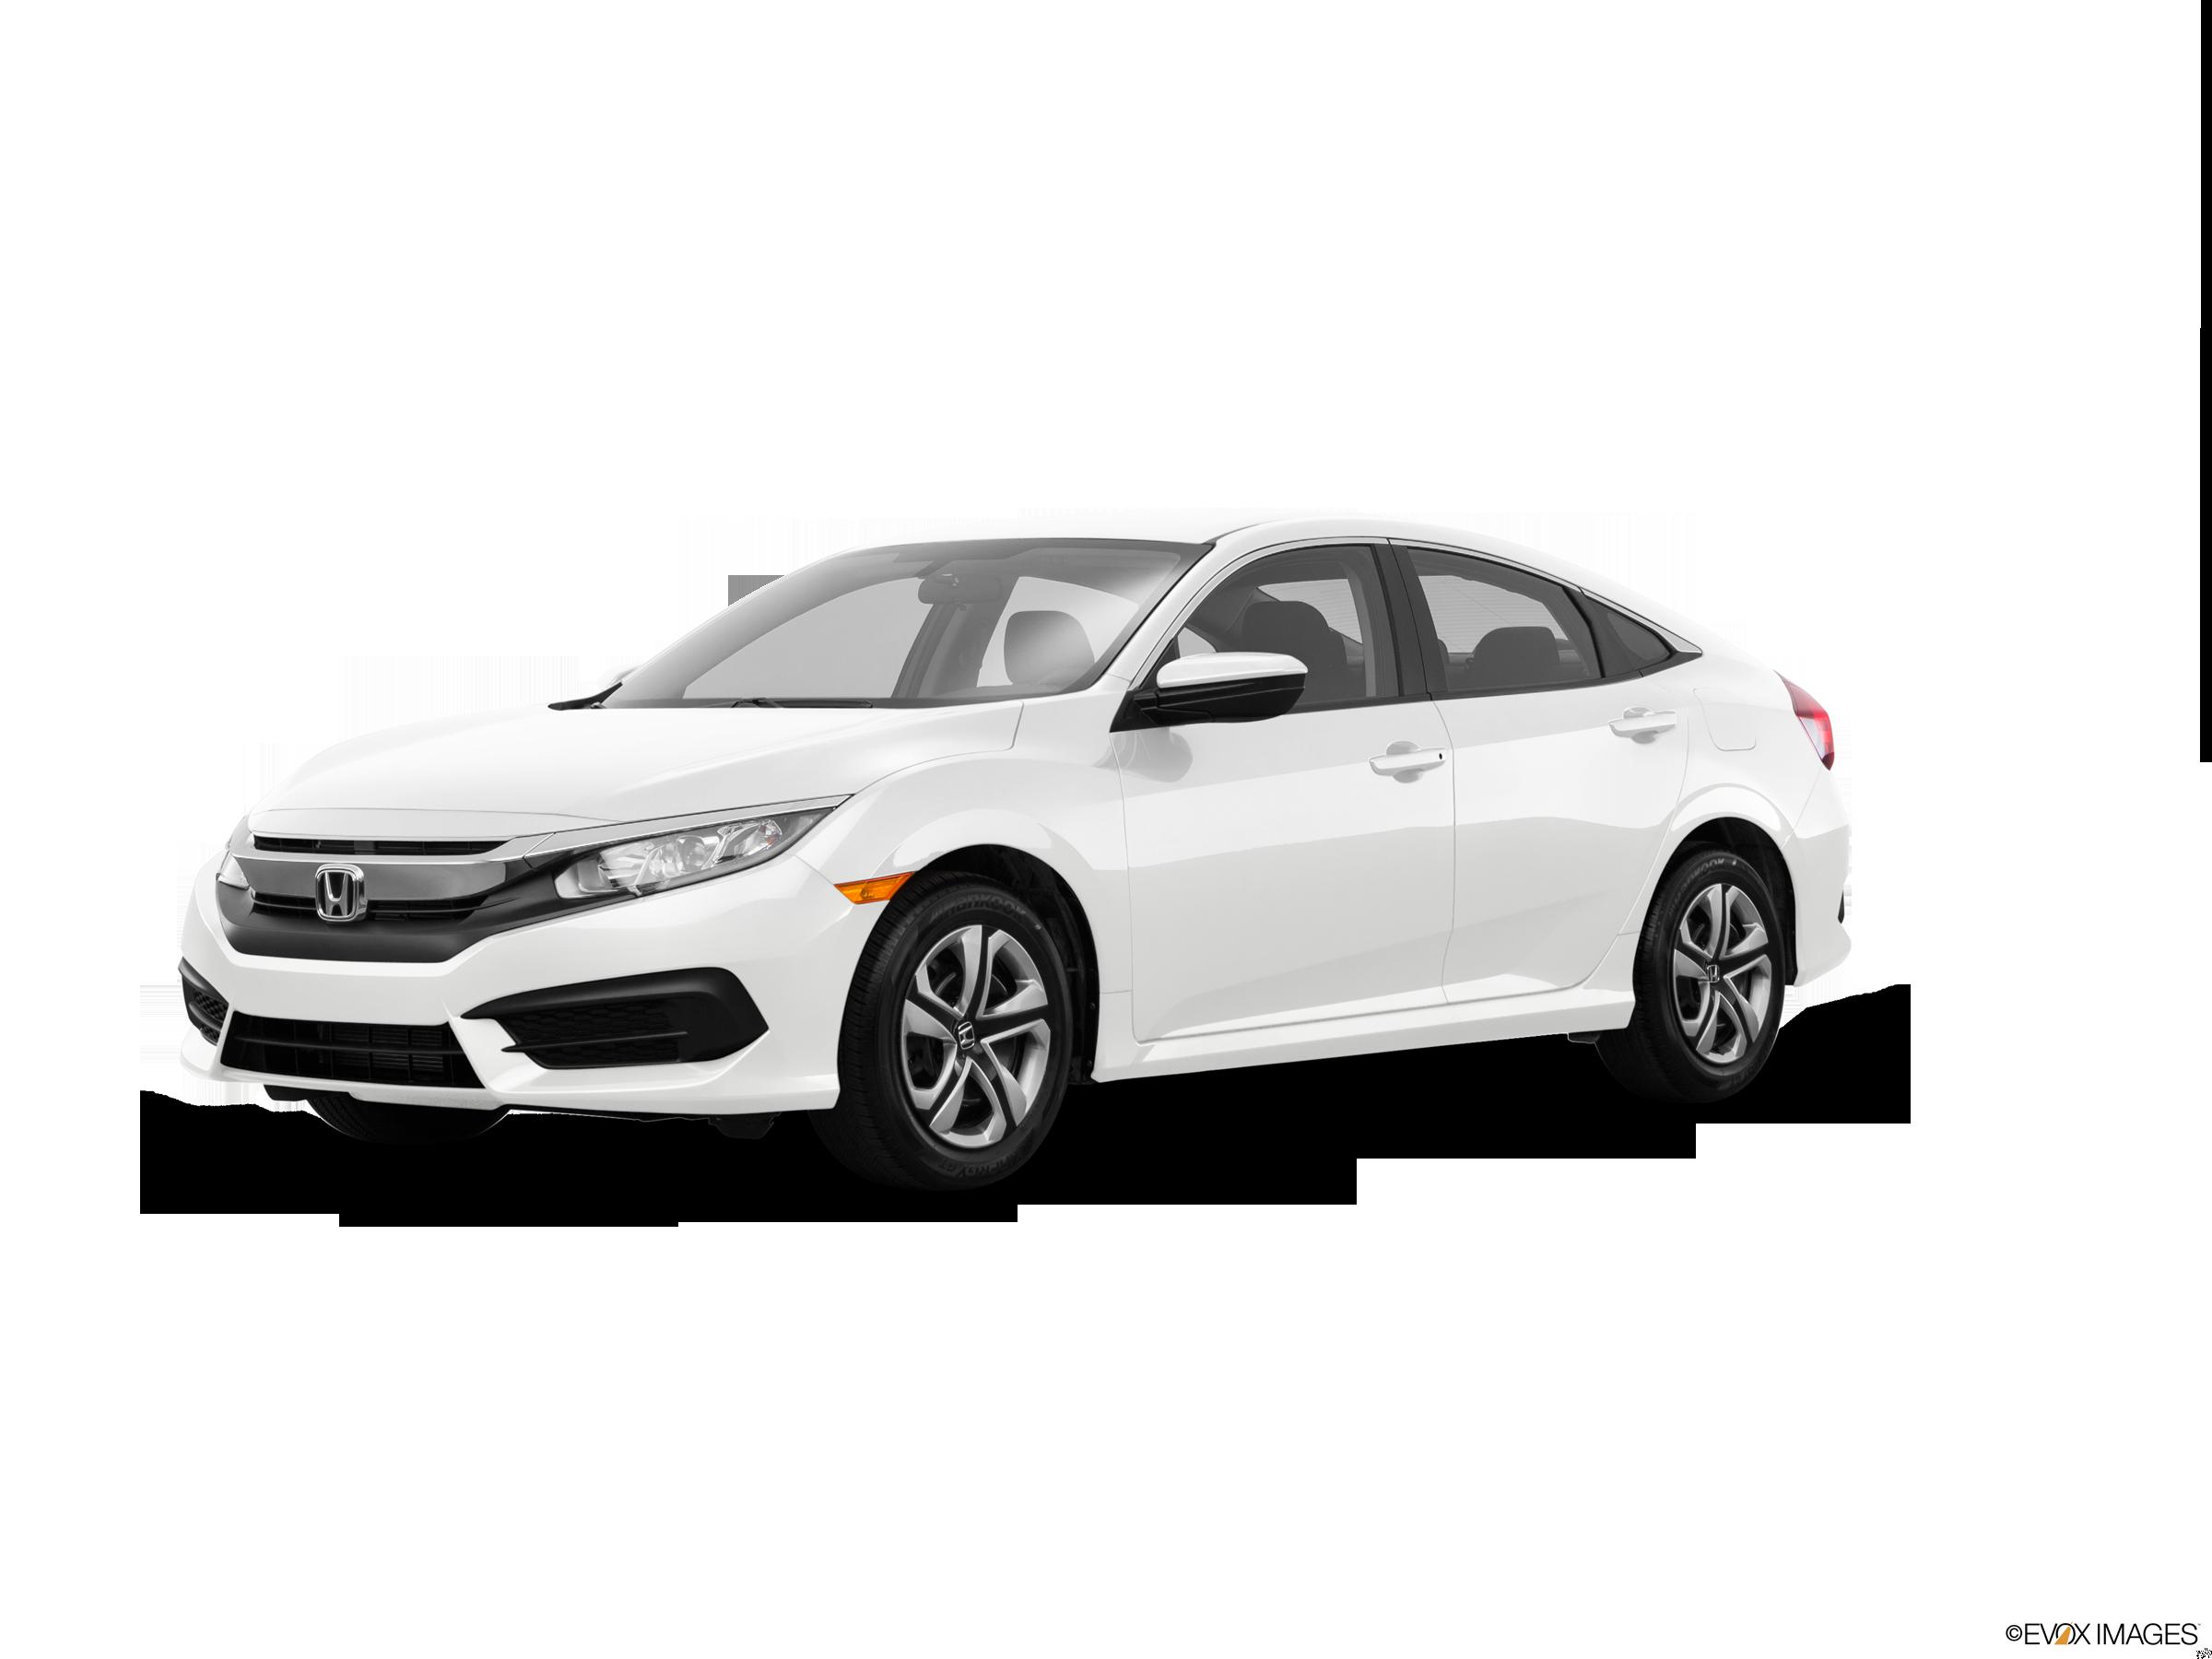 2016 Honda Civic Values Cars For Sale Kelley Blue Book